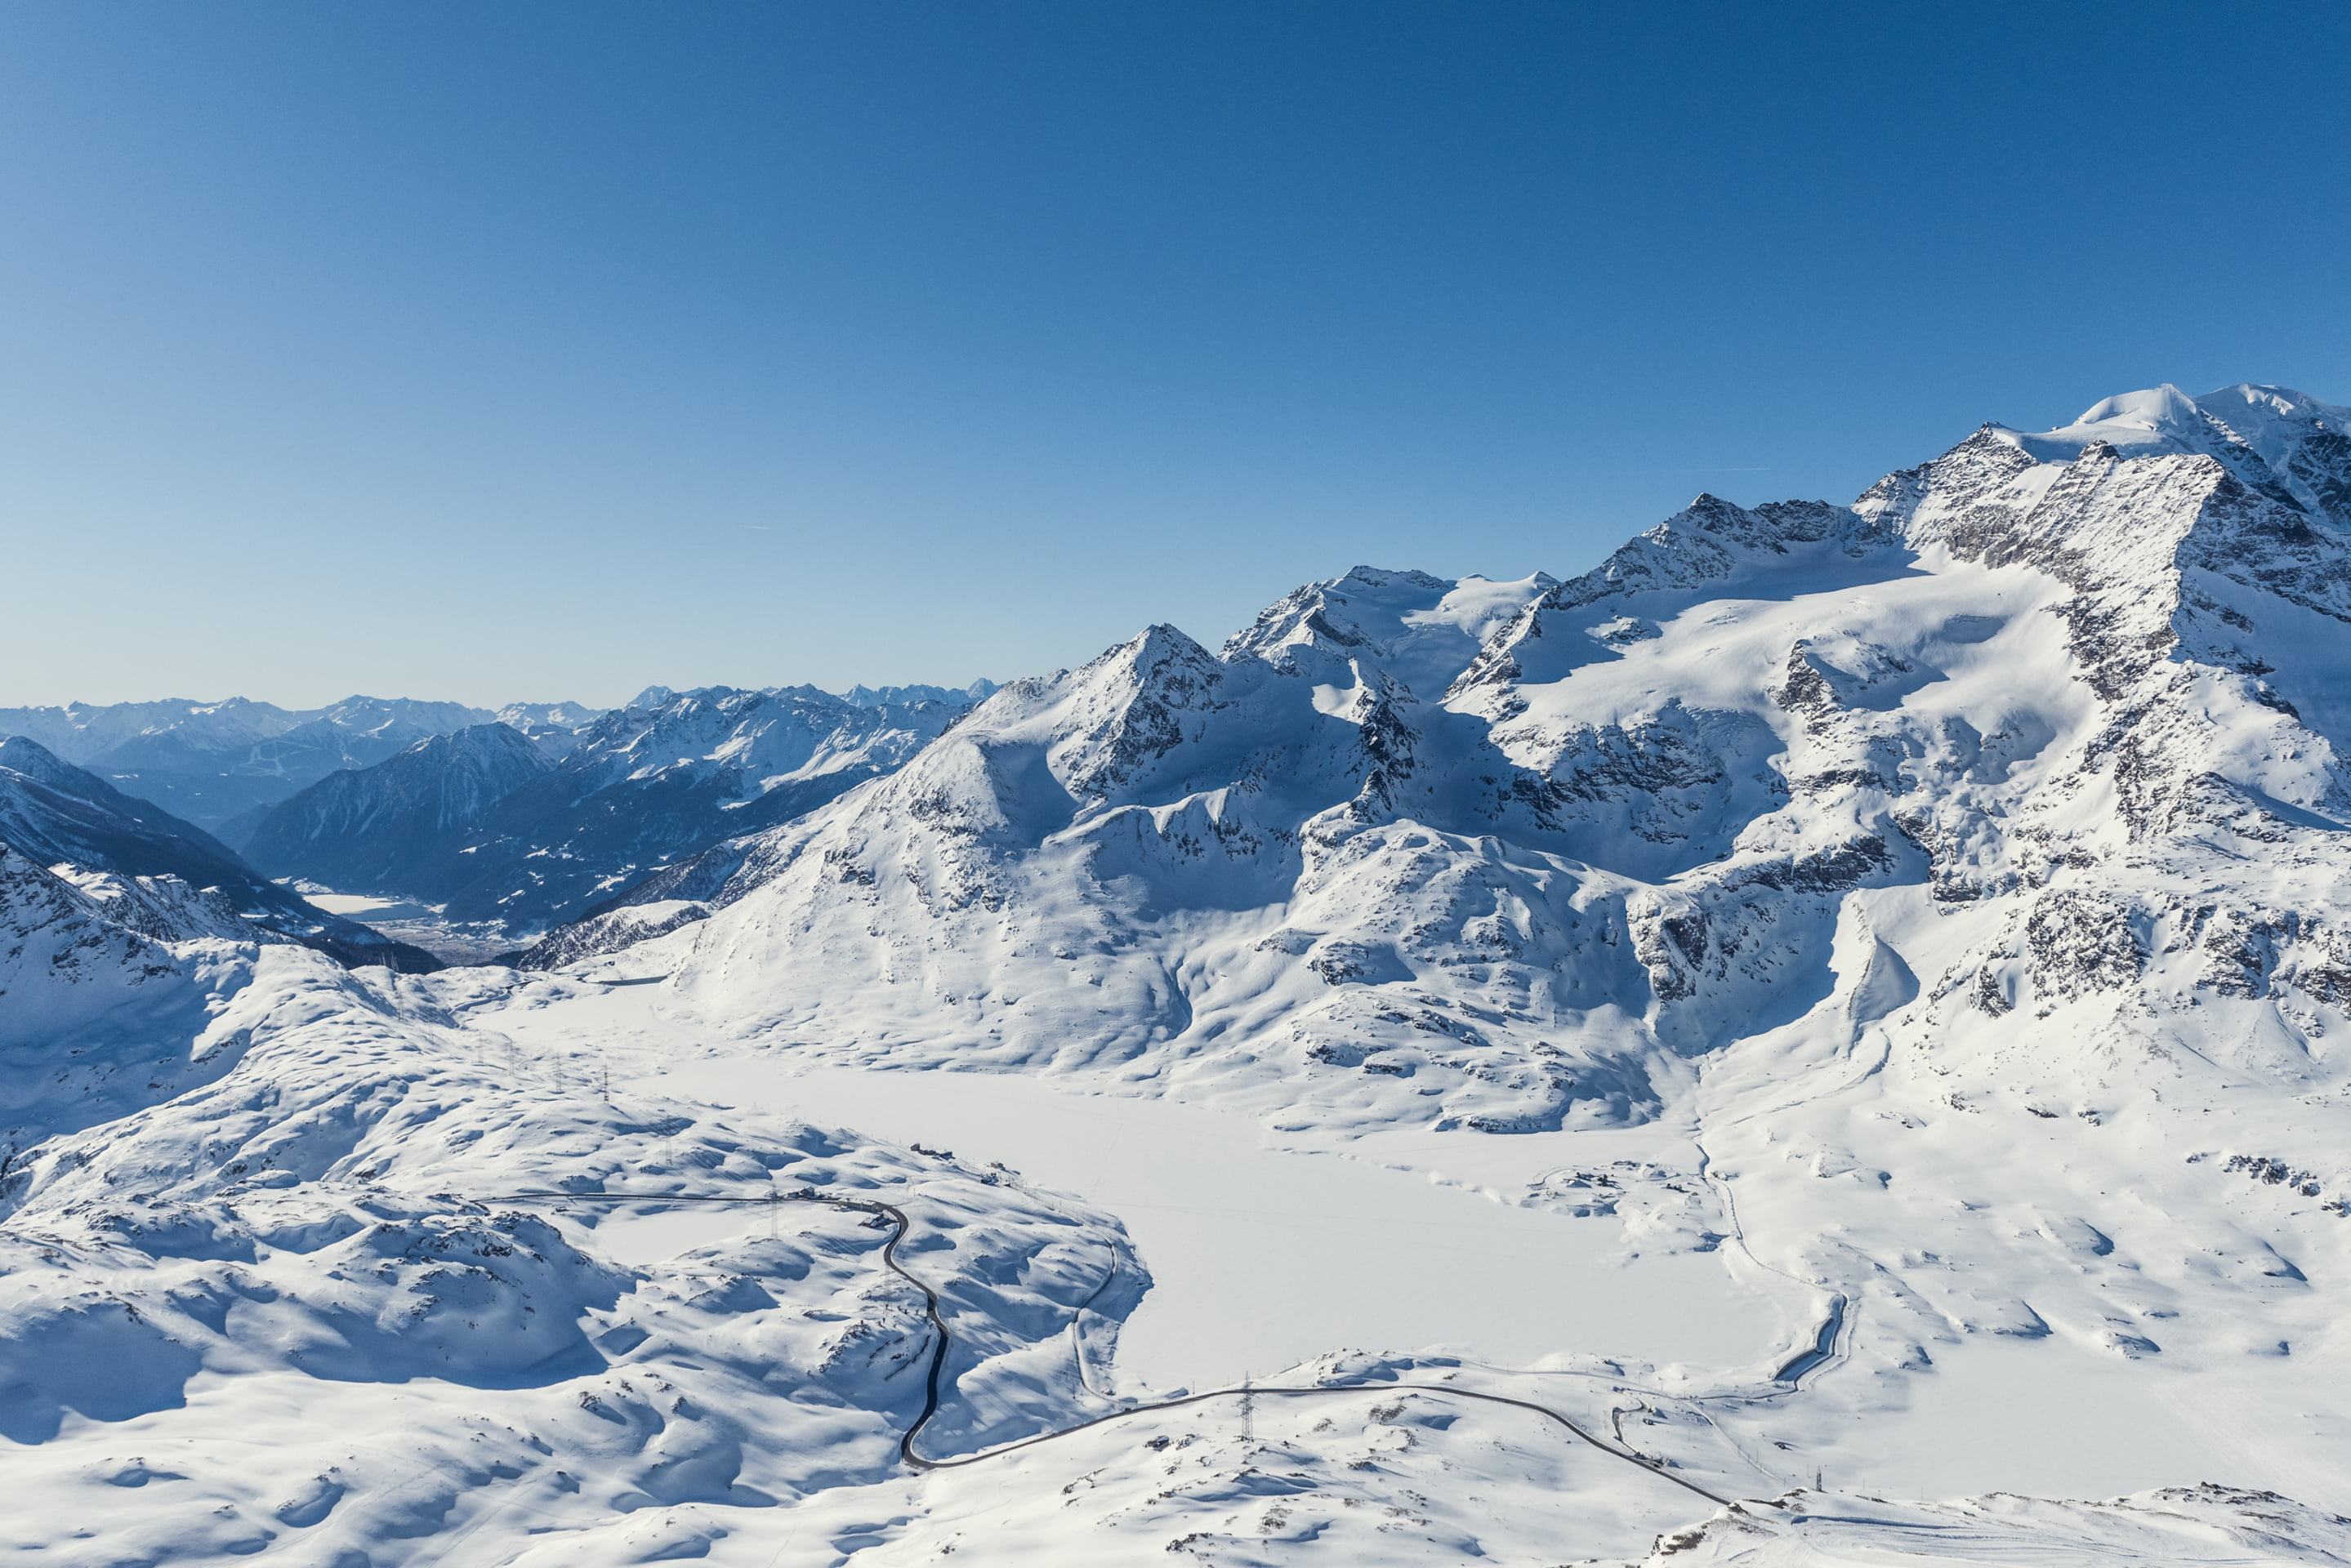 Rent A Car In St Moritz Switzerland